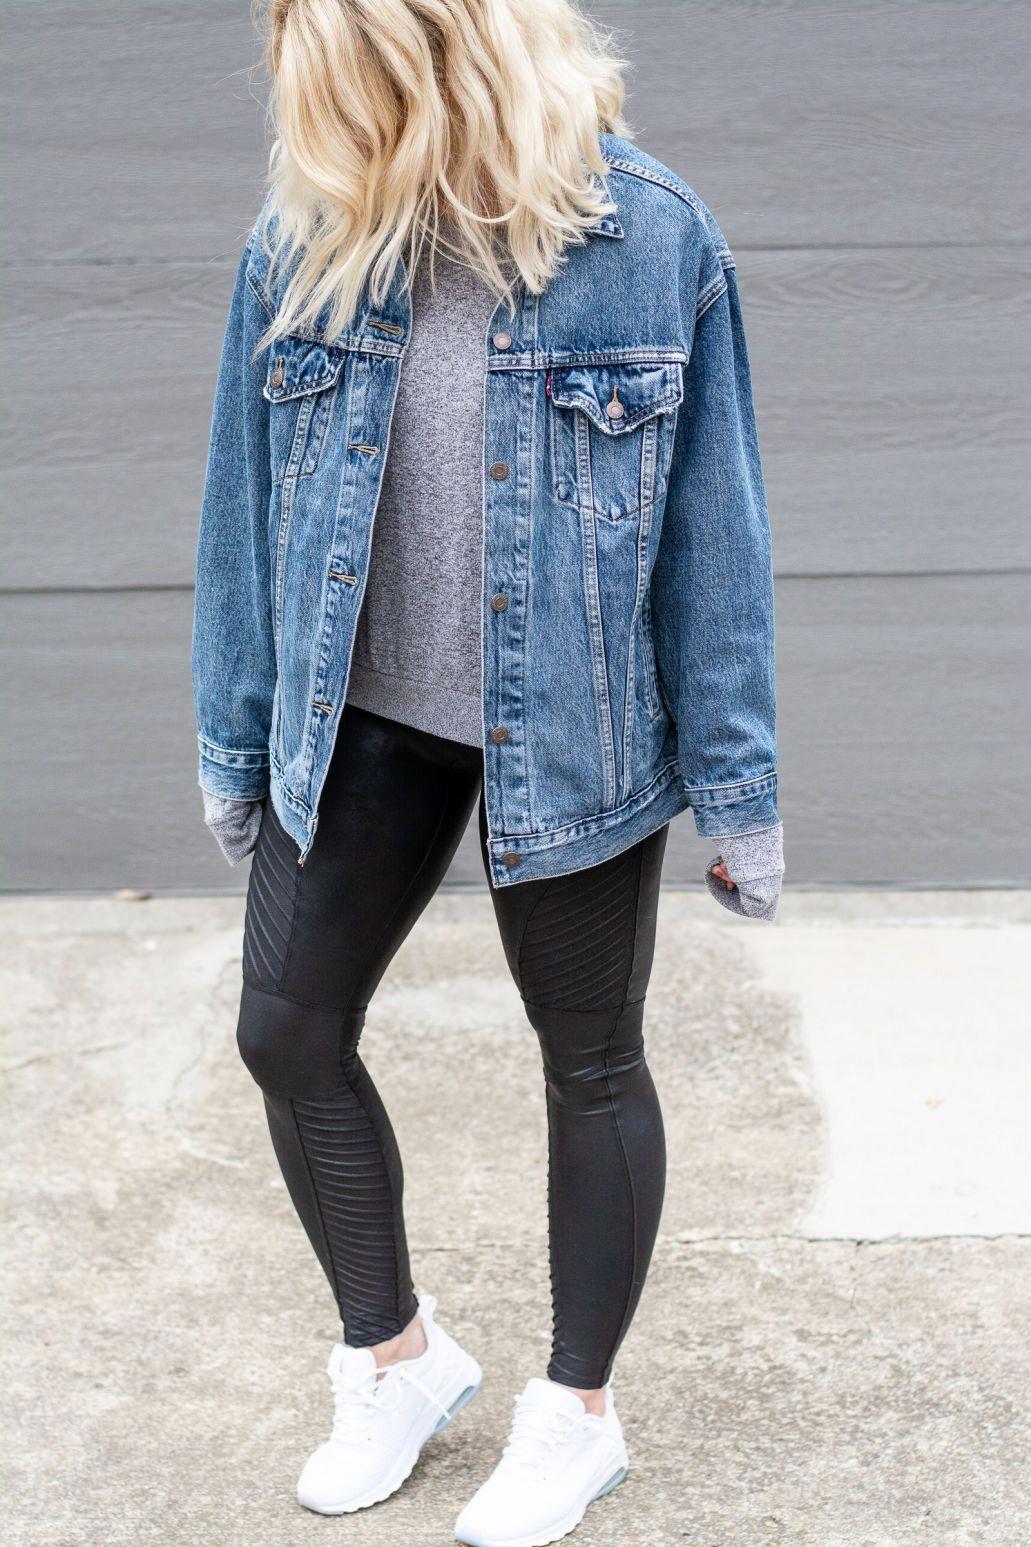 Teenagers Trendy Ideas Springteenfashion Oversized Jean Jacket Outfit Oversized Denim Jacket Outfit Oversized Jean Jacket [ 1547 x 1031 Pixel ]